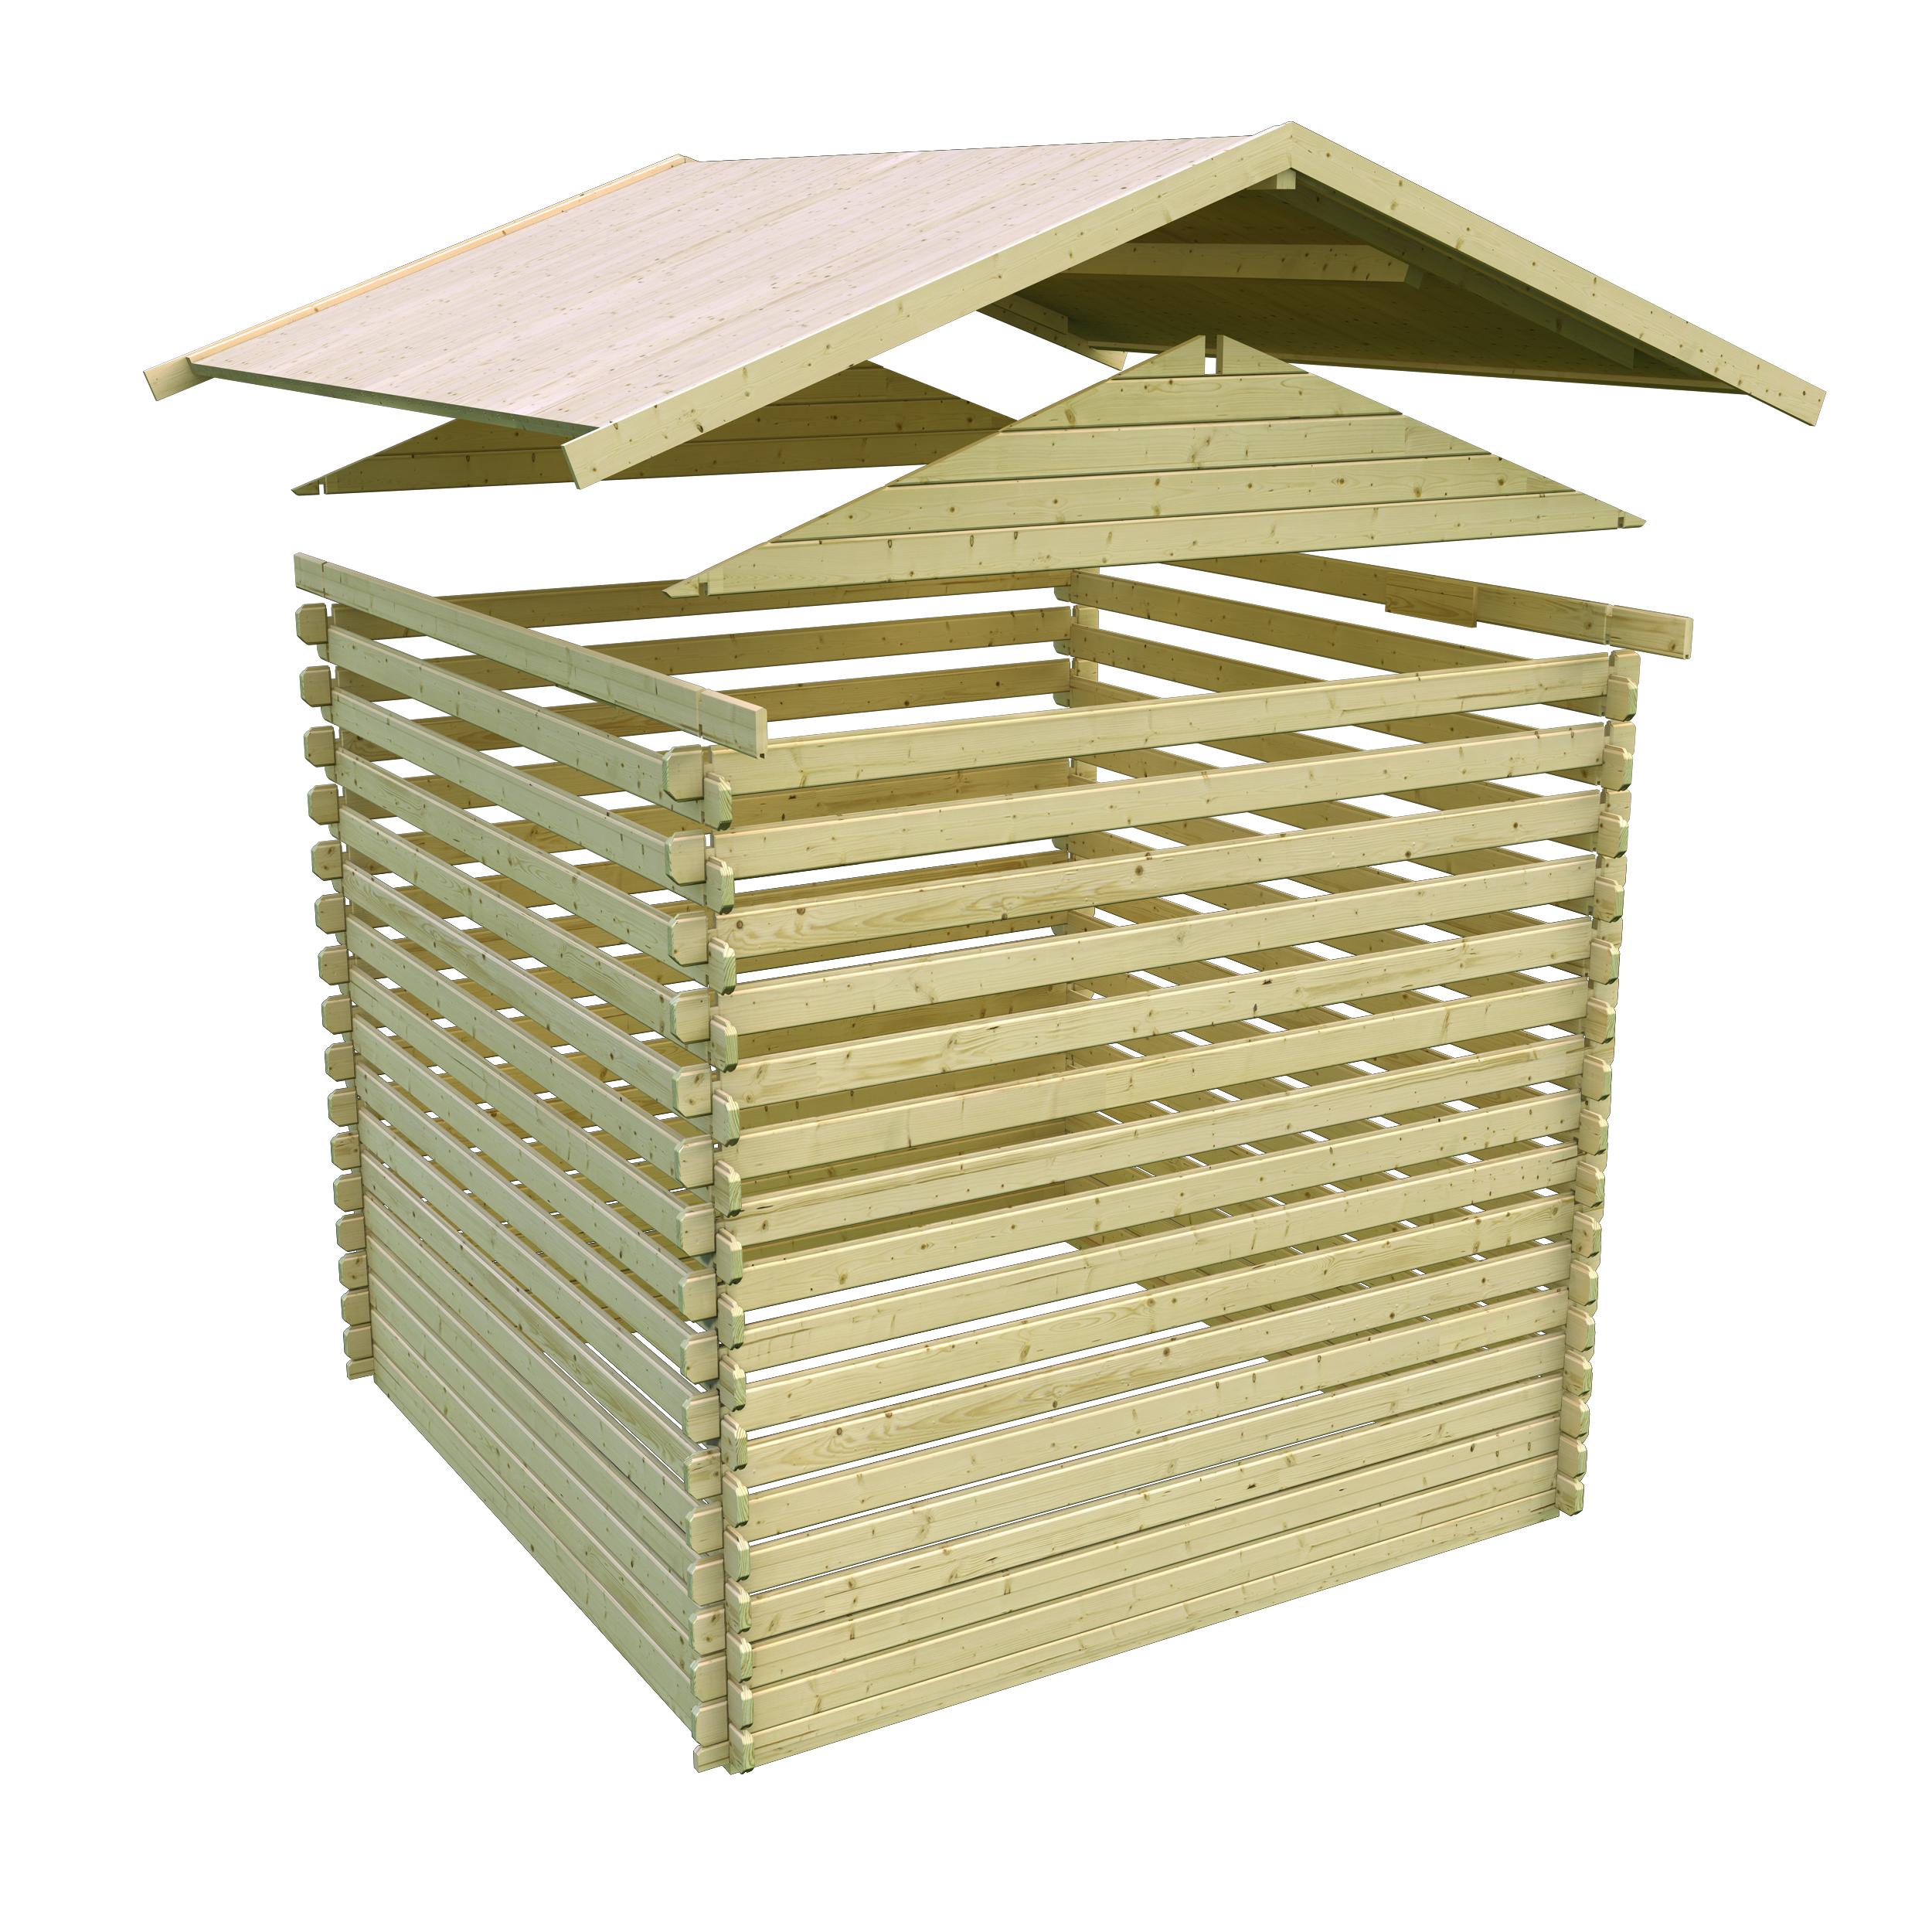 Woodfeeling Gartenhaus 38 mm Meldorf 6 VD+Terrasse natur 404x590cm Bild 9